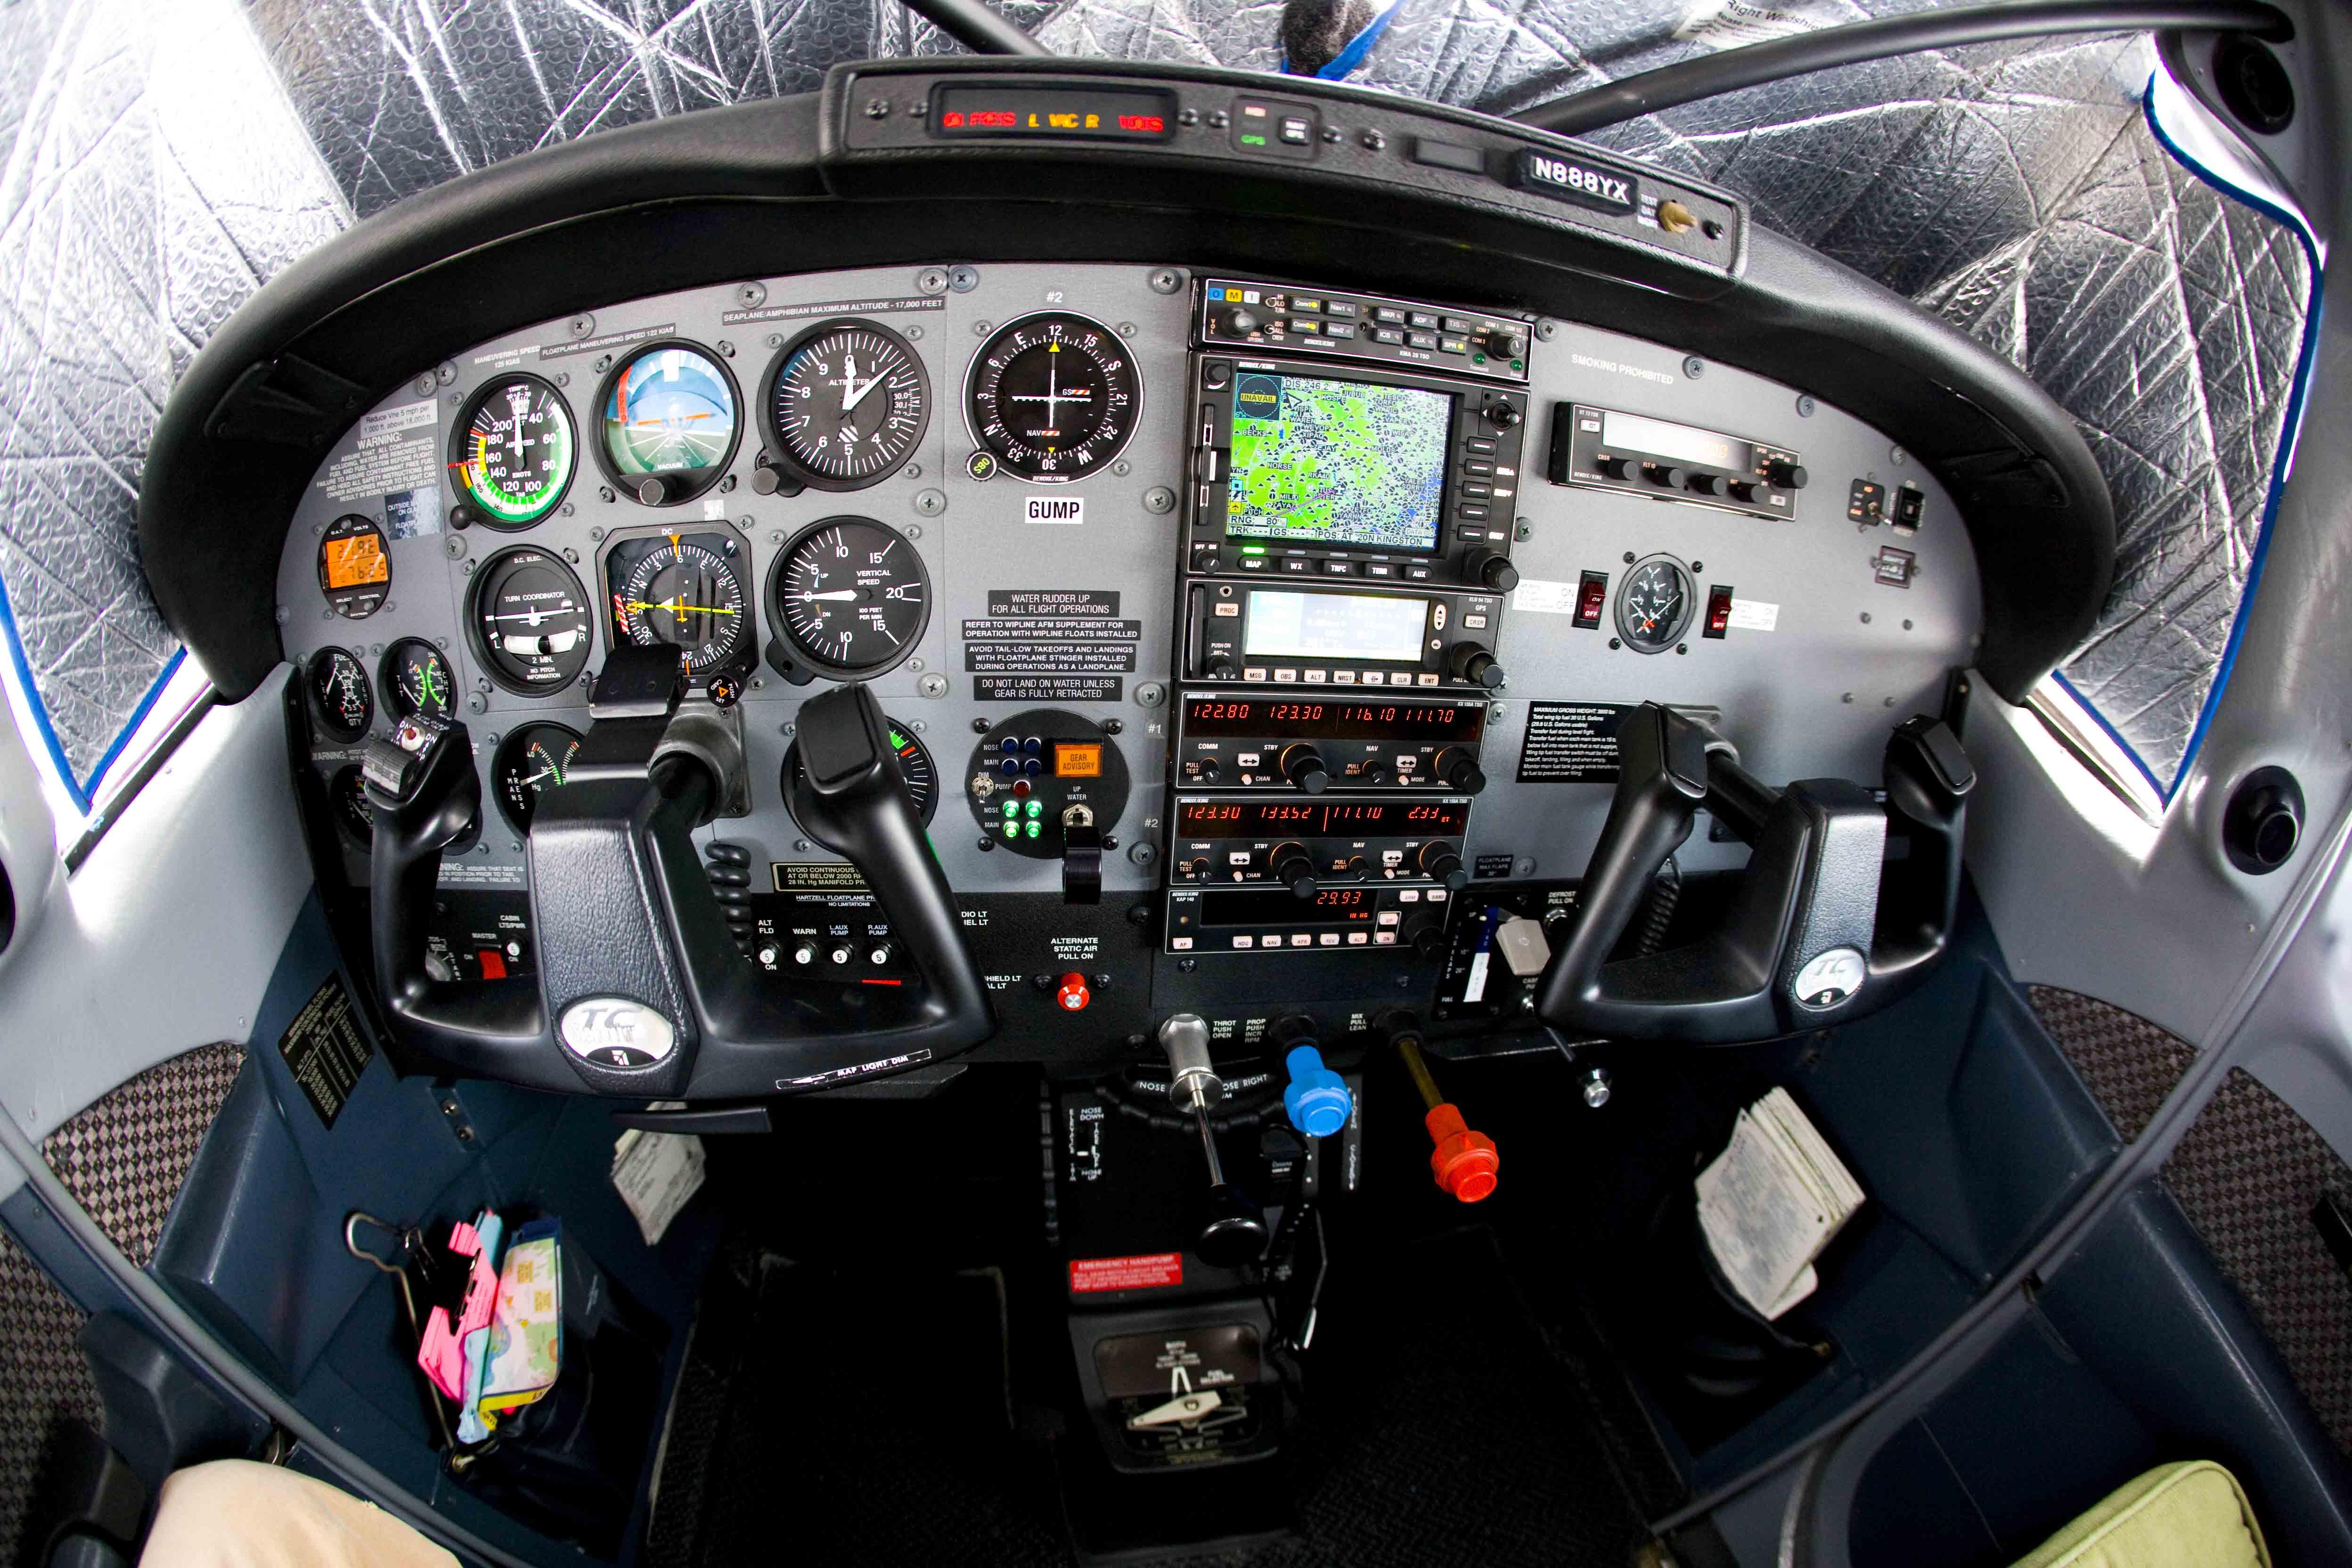 Cockpit Instrument Panel : Cessna military wiki fandom powered by wikia